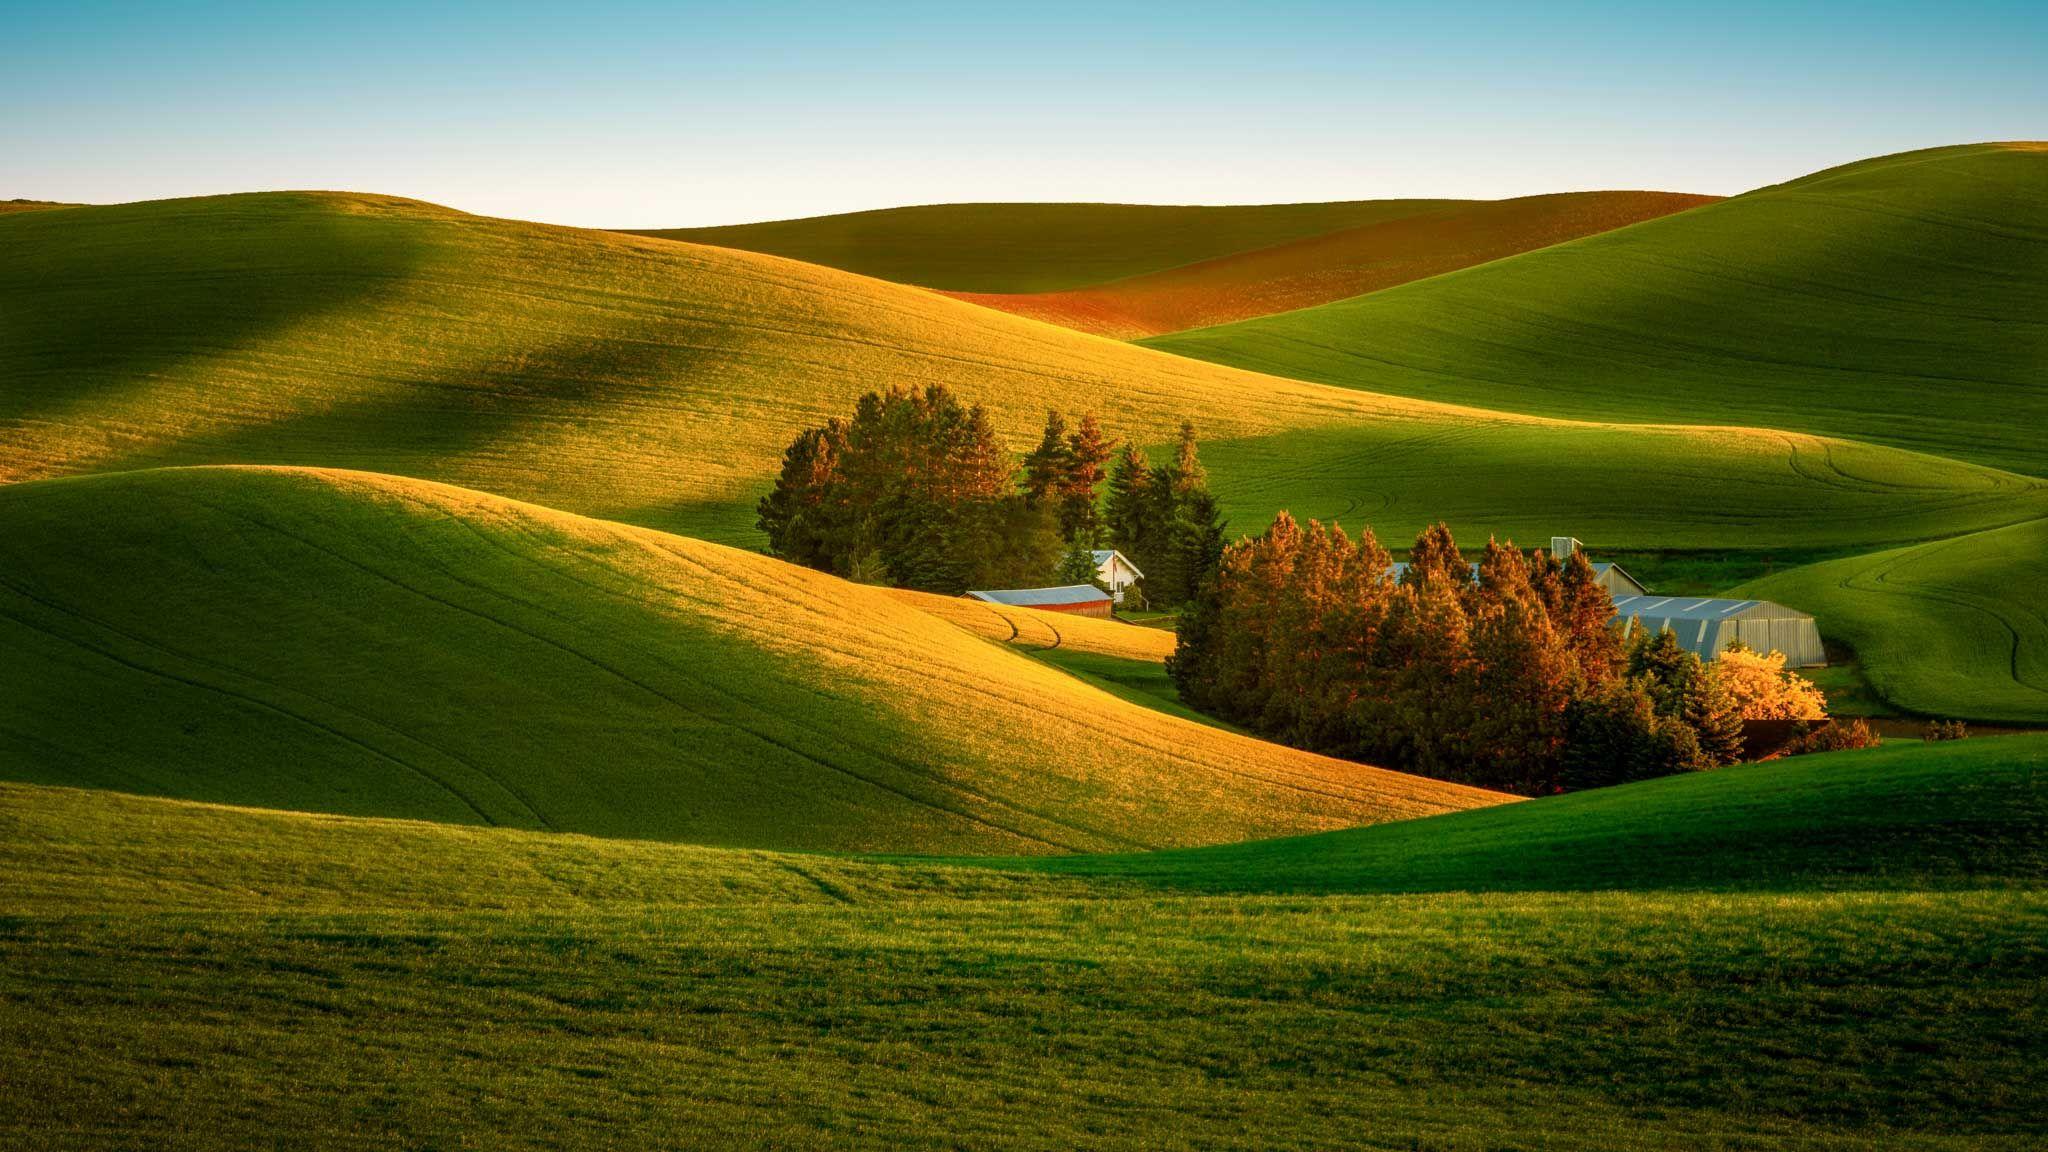 Sunrise on a small farm in the Palouse region of